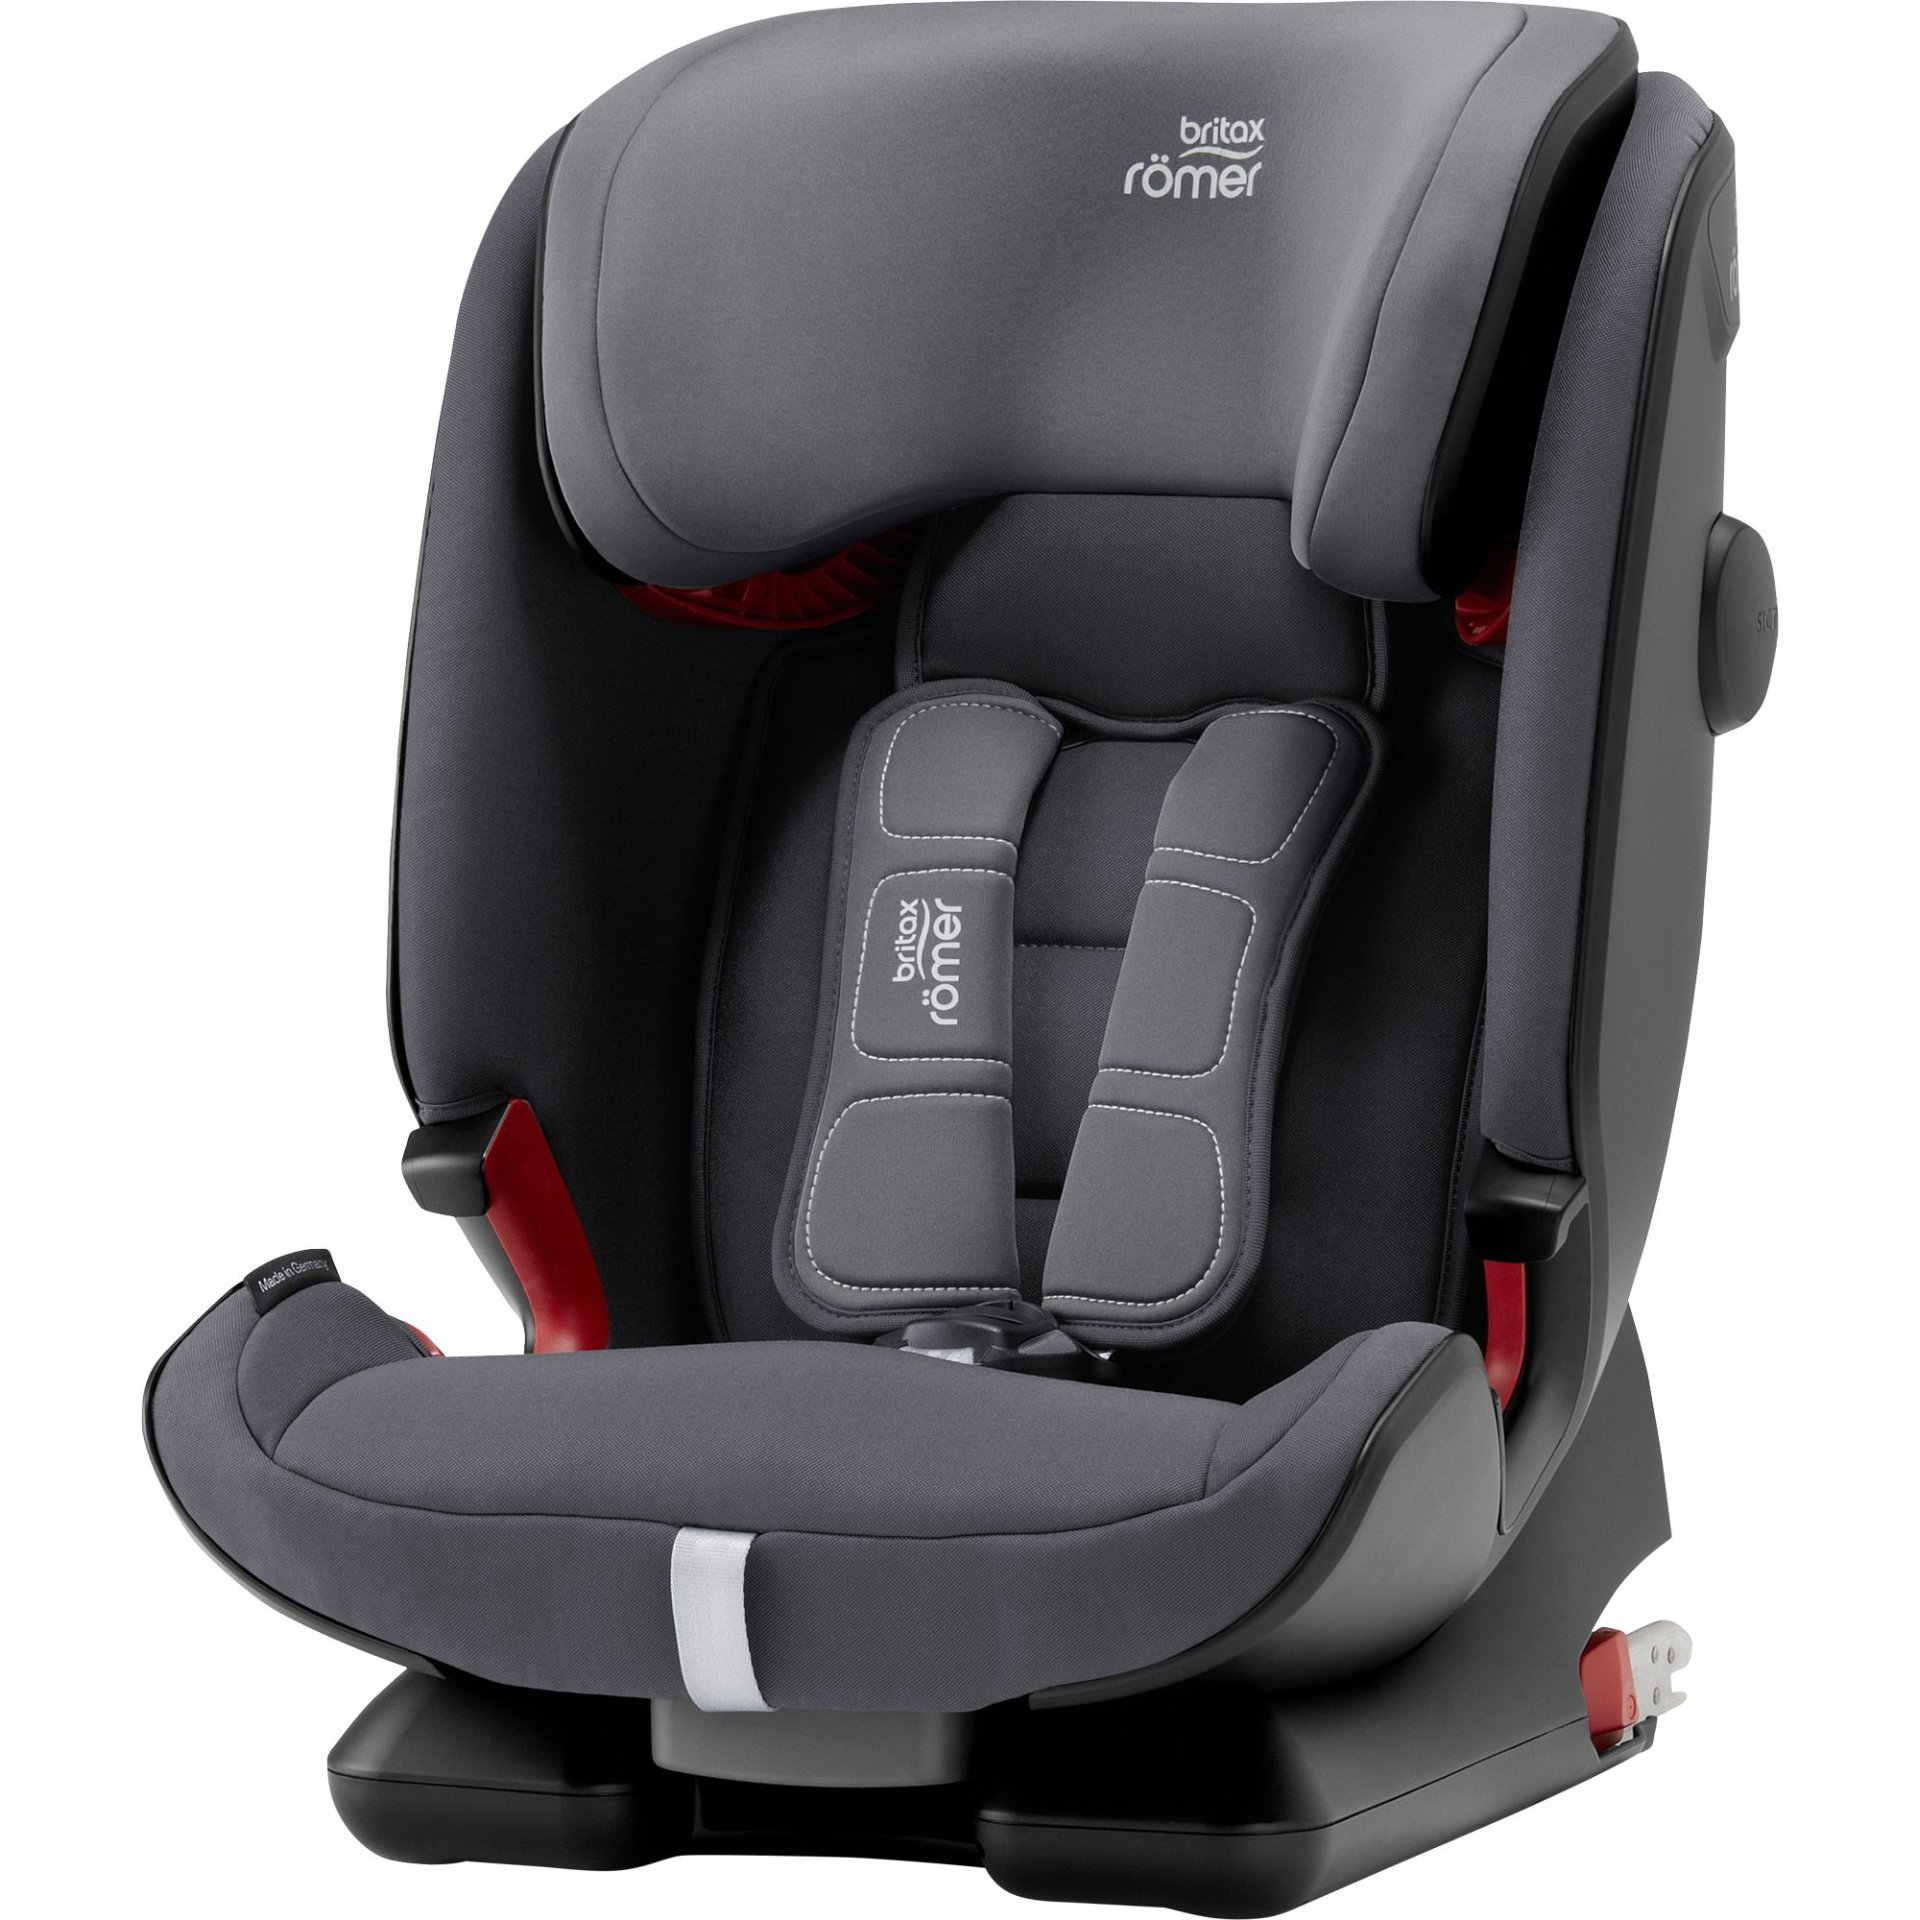 Britax Rmer Child Car Seat Advansafix IV R Storm Grey 2019